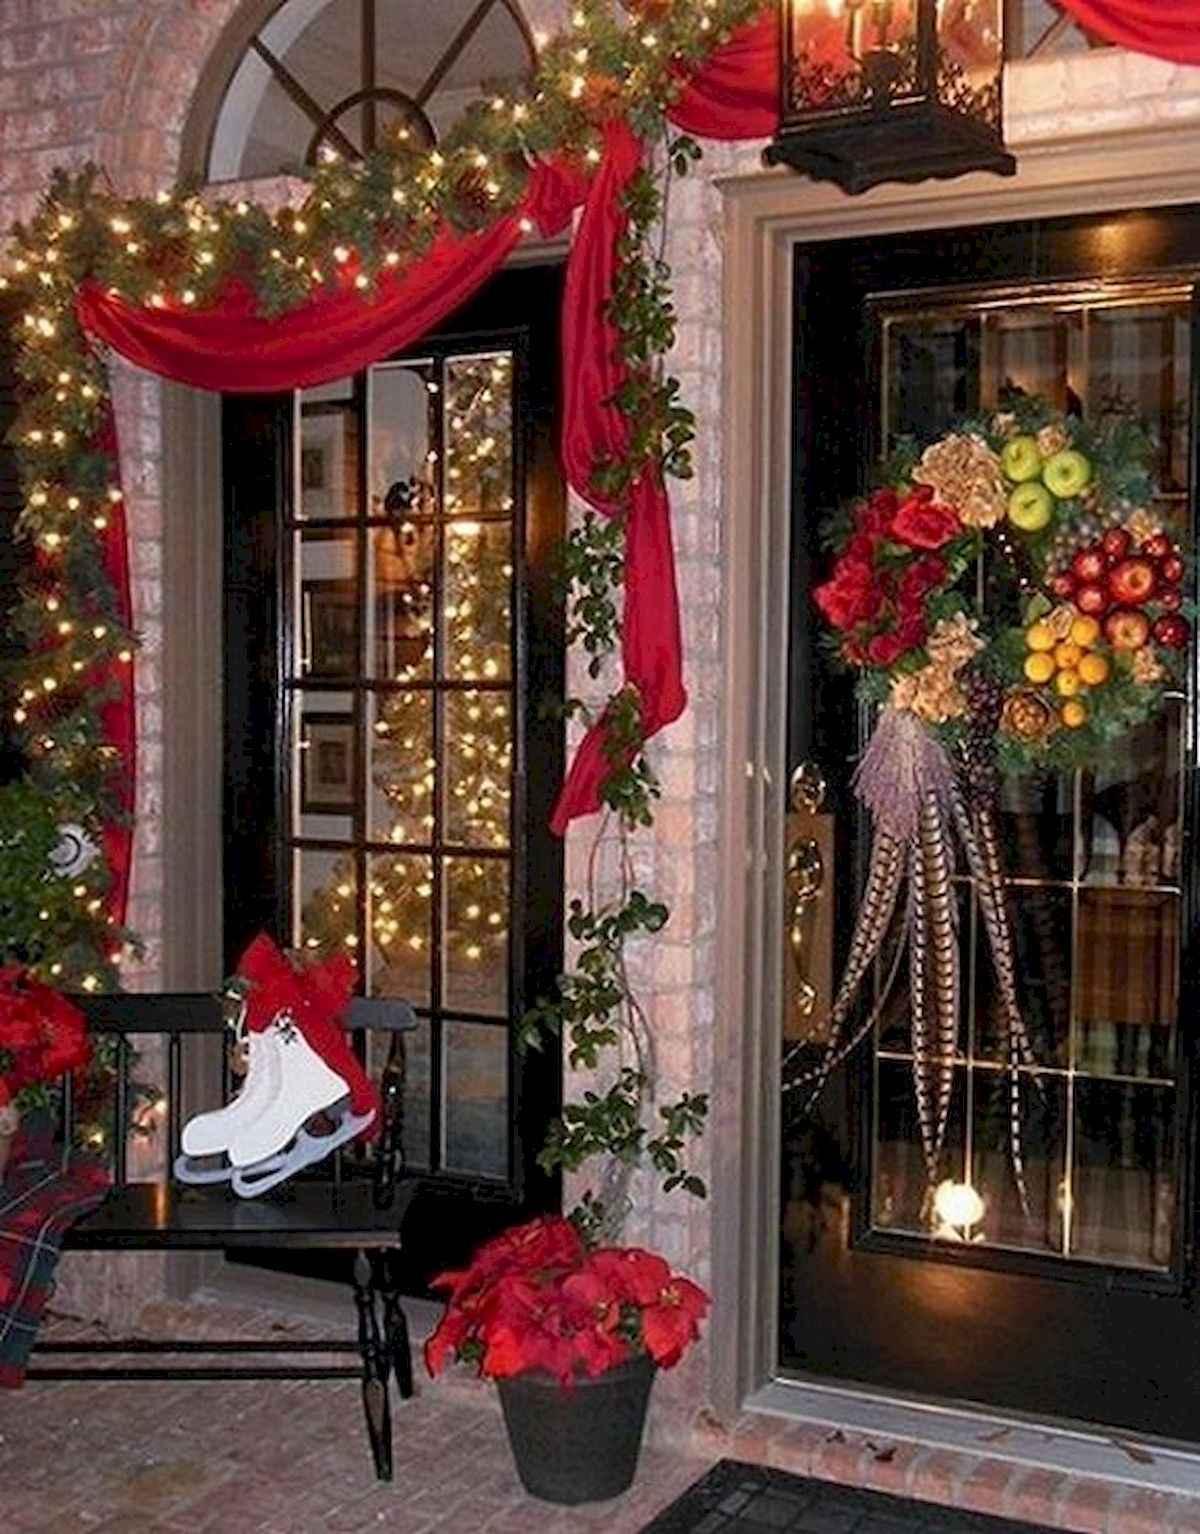 40 amazing outdoor christmas decorations ideas (2)